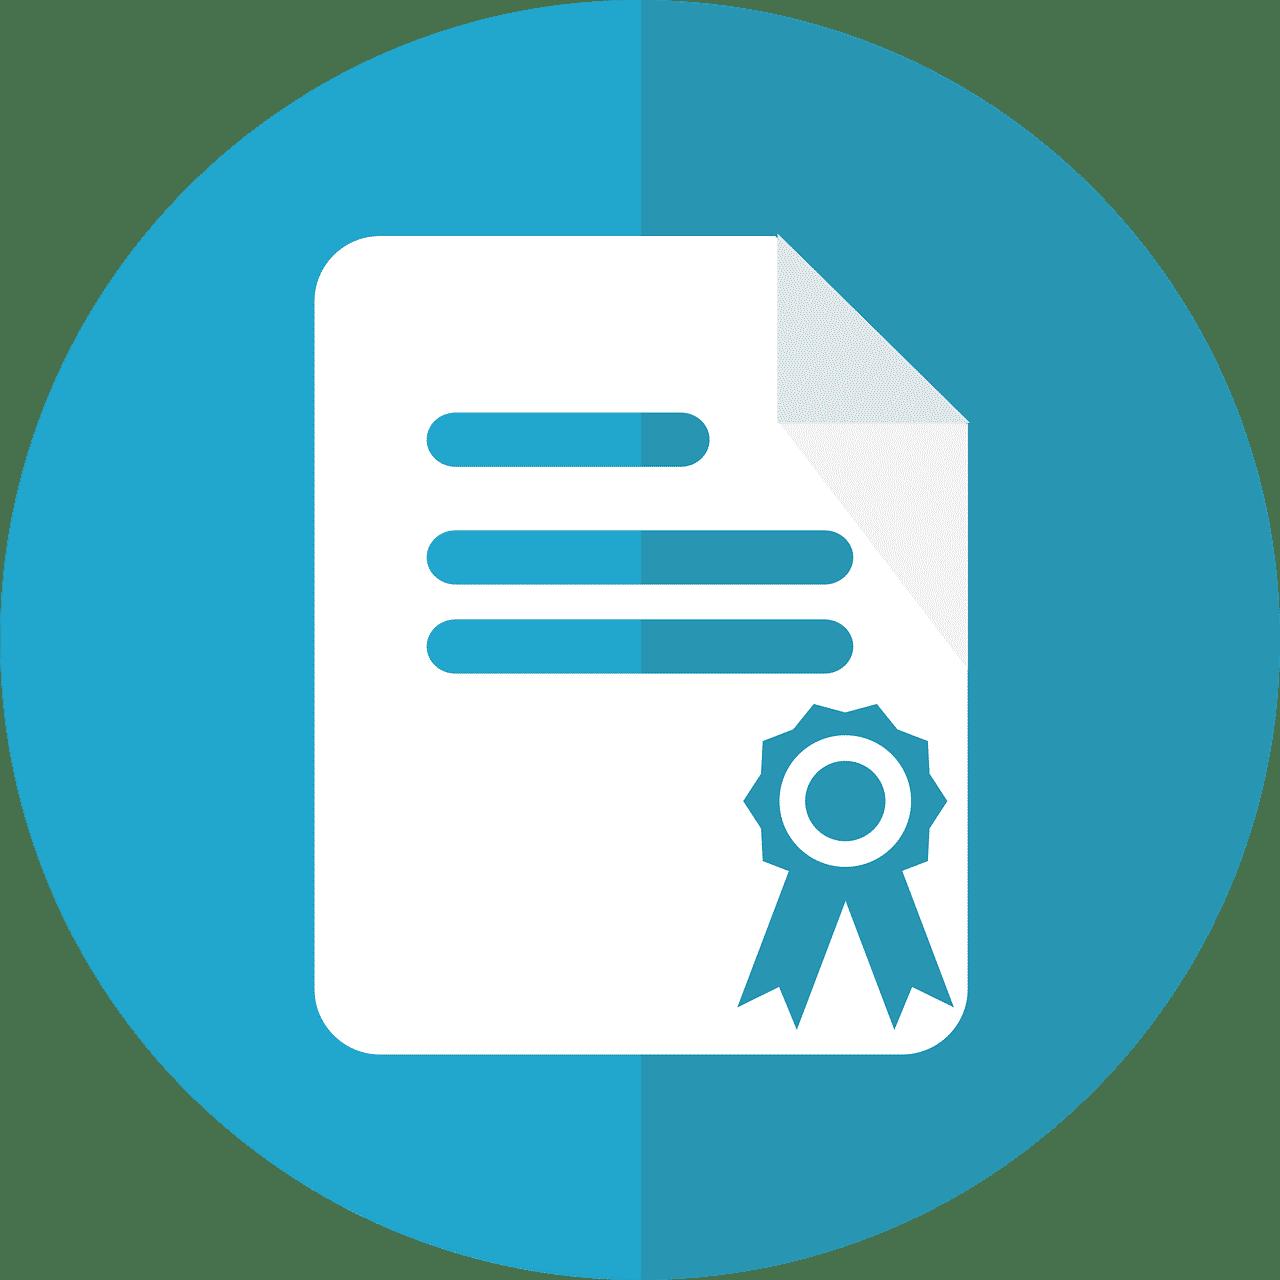 Certificado -Abertura de Igreja em Brasília - DF